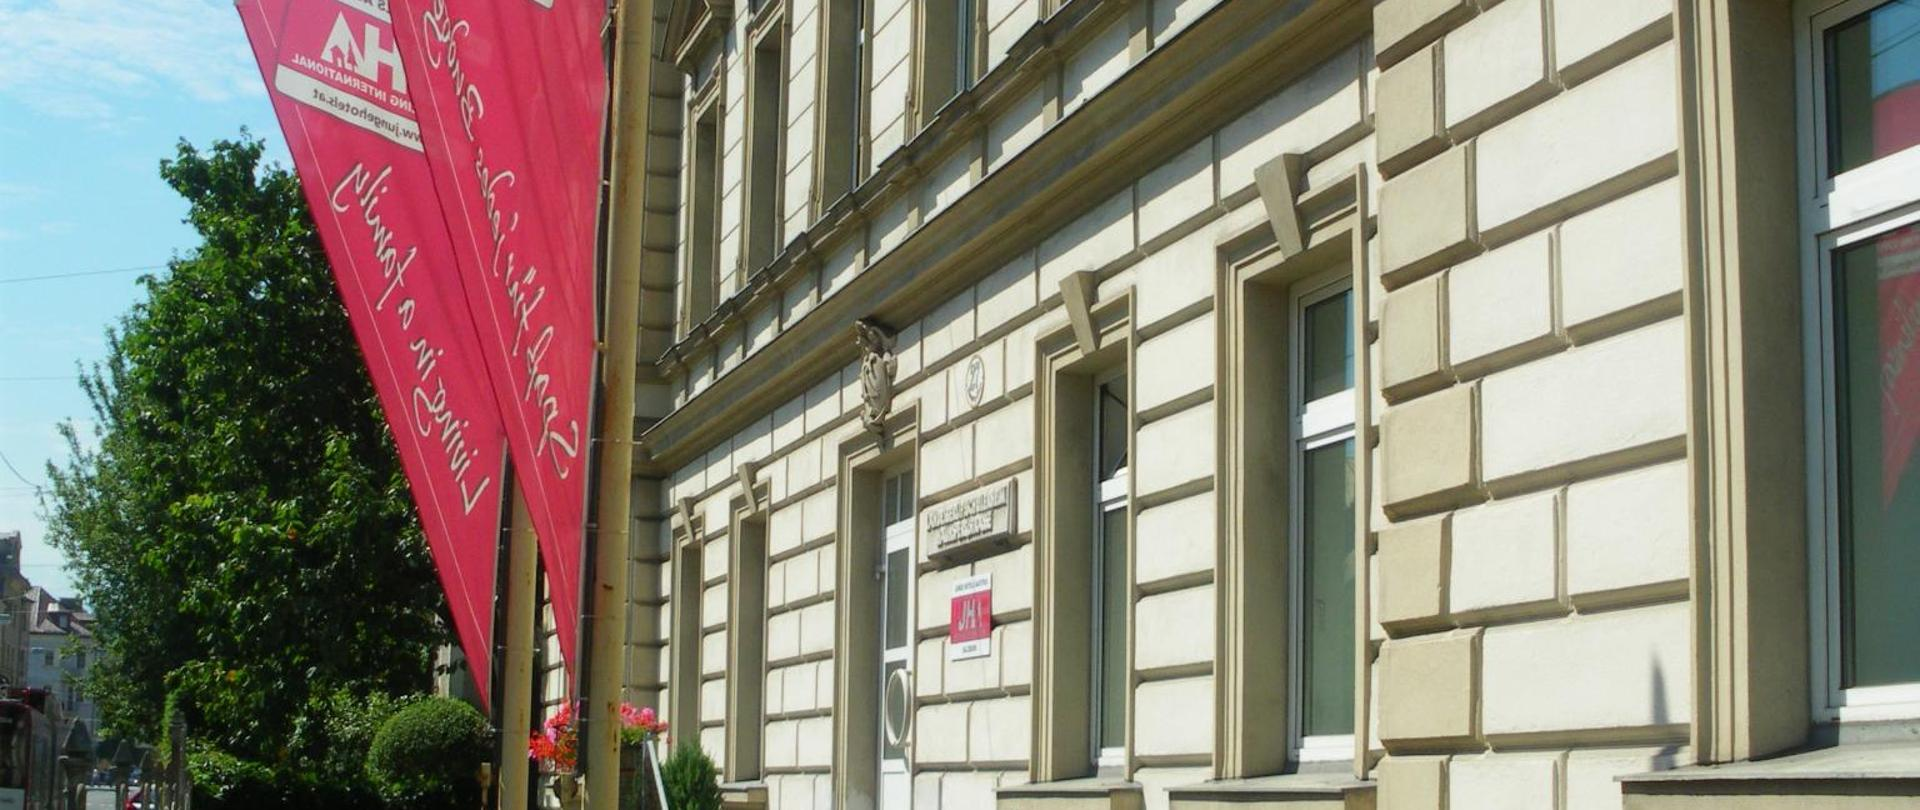 Hostel Haunspergstraße